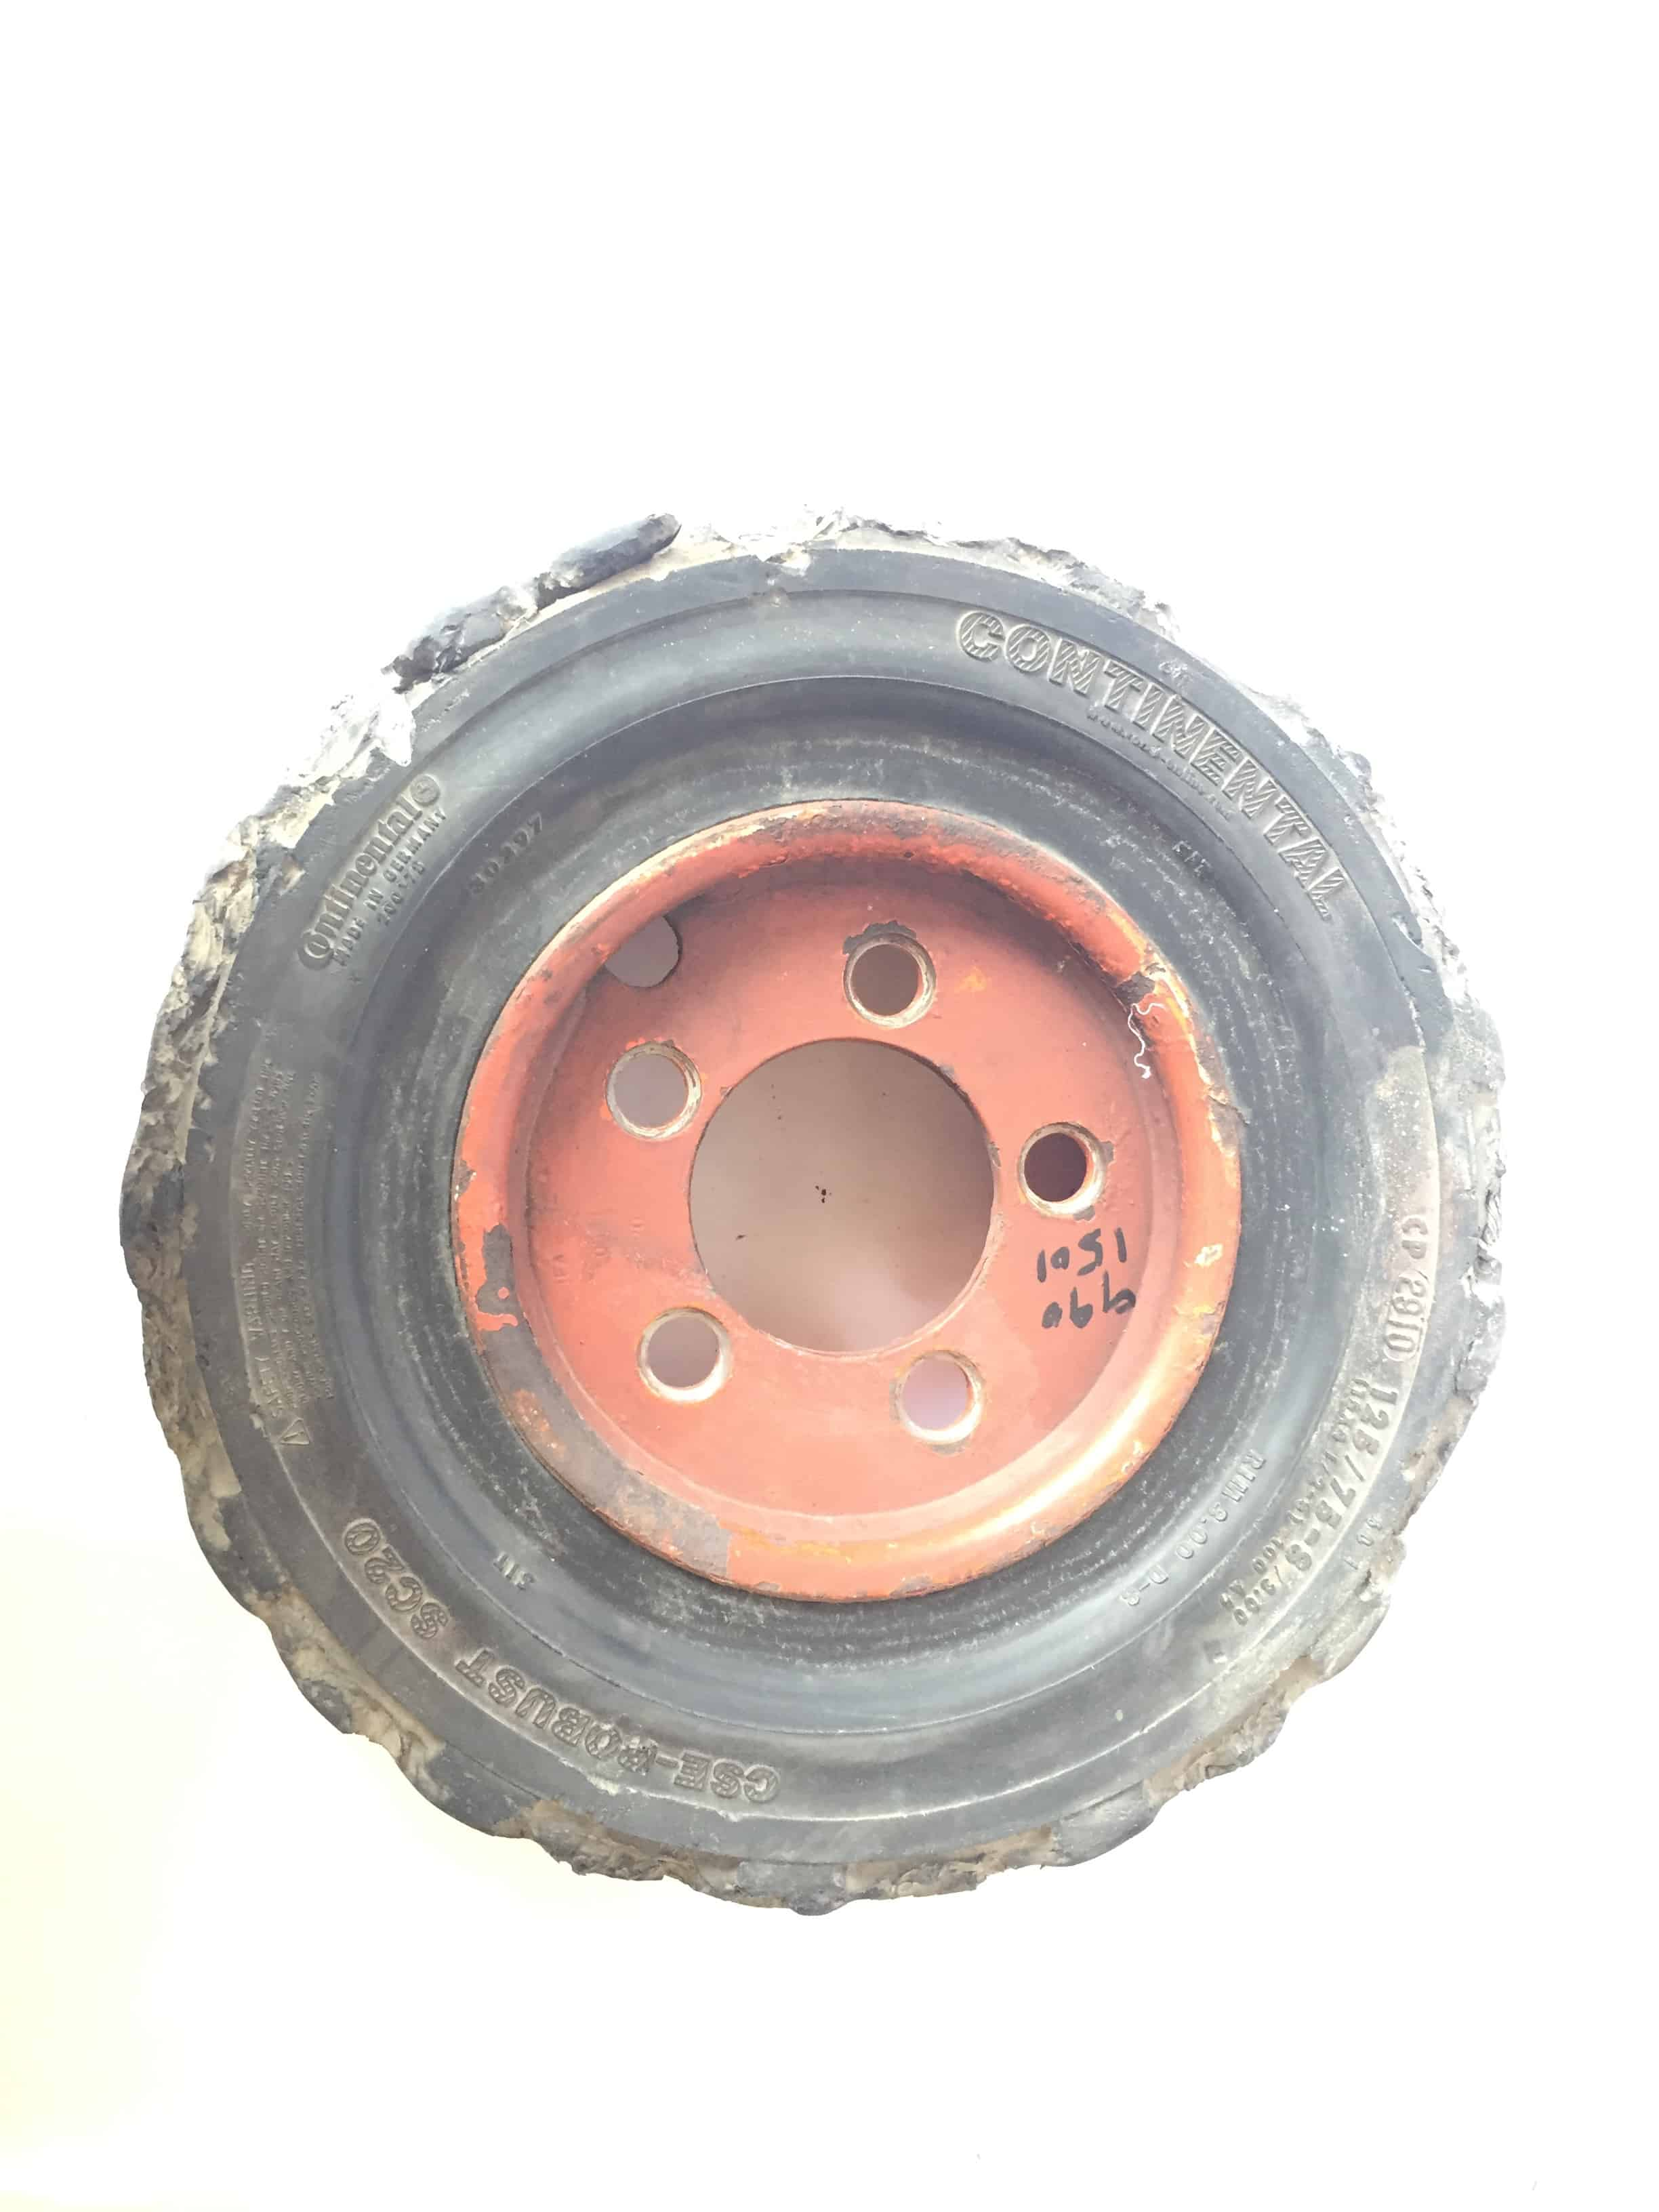   Disc wheel assy. 4,33R-8   Fazl-e-Rasheed and Company August 2021